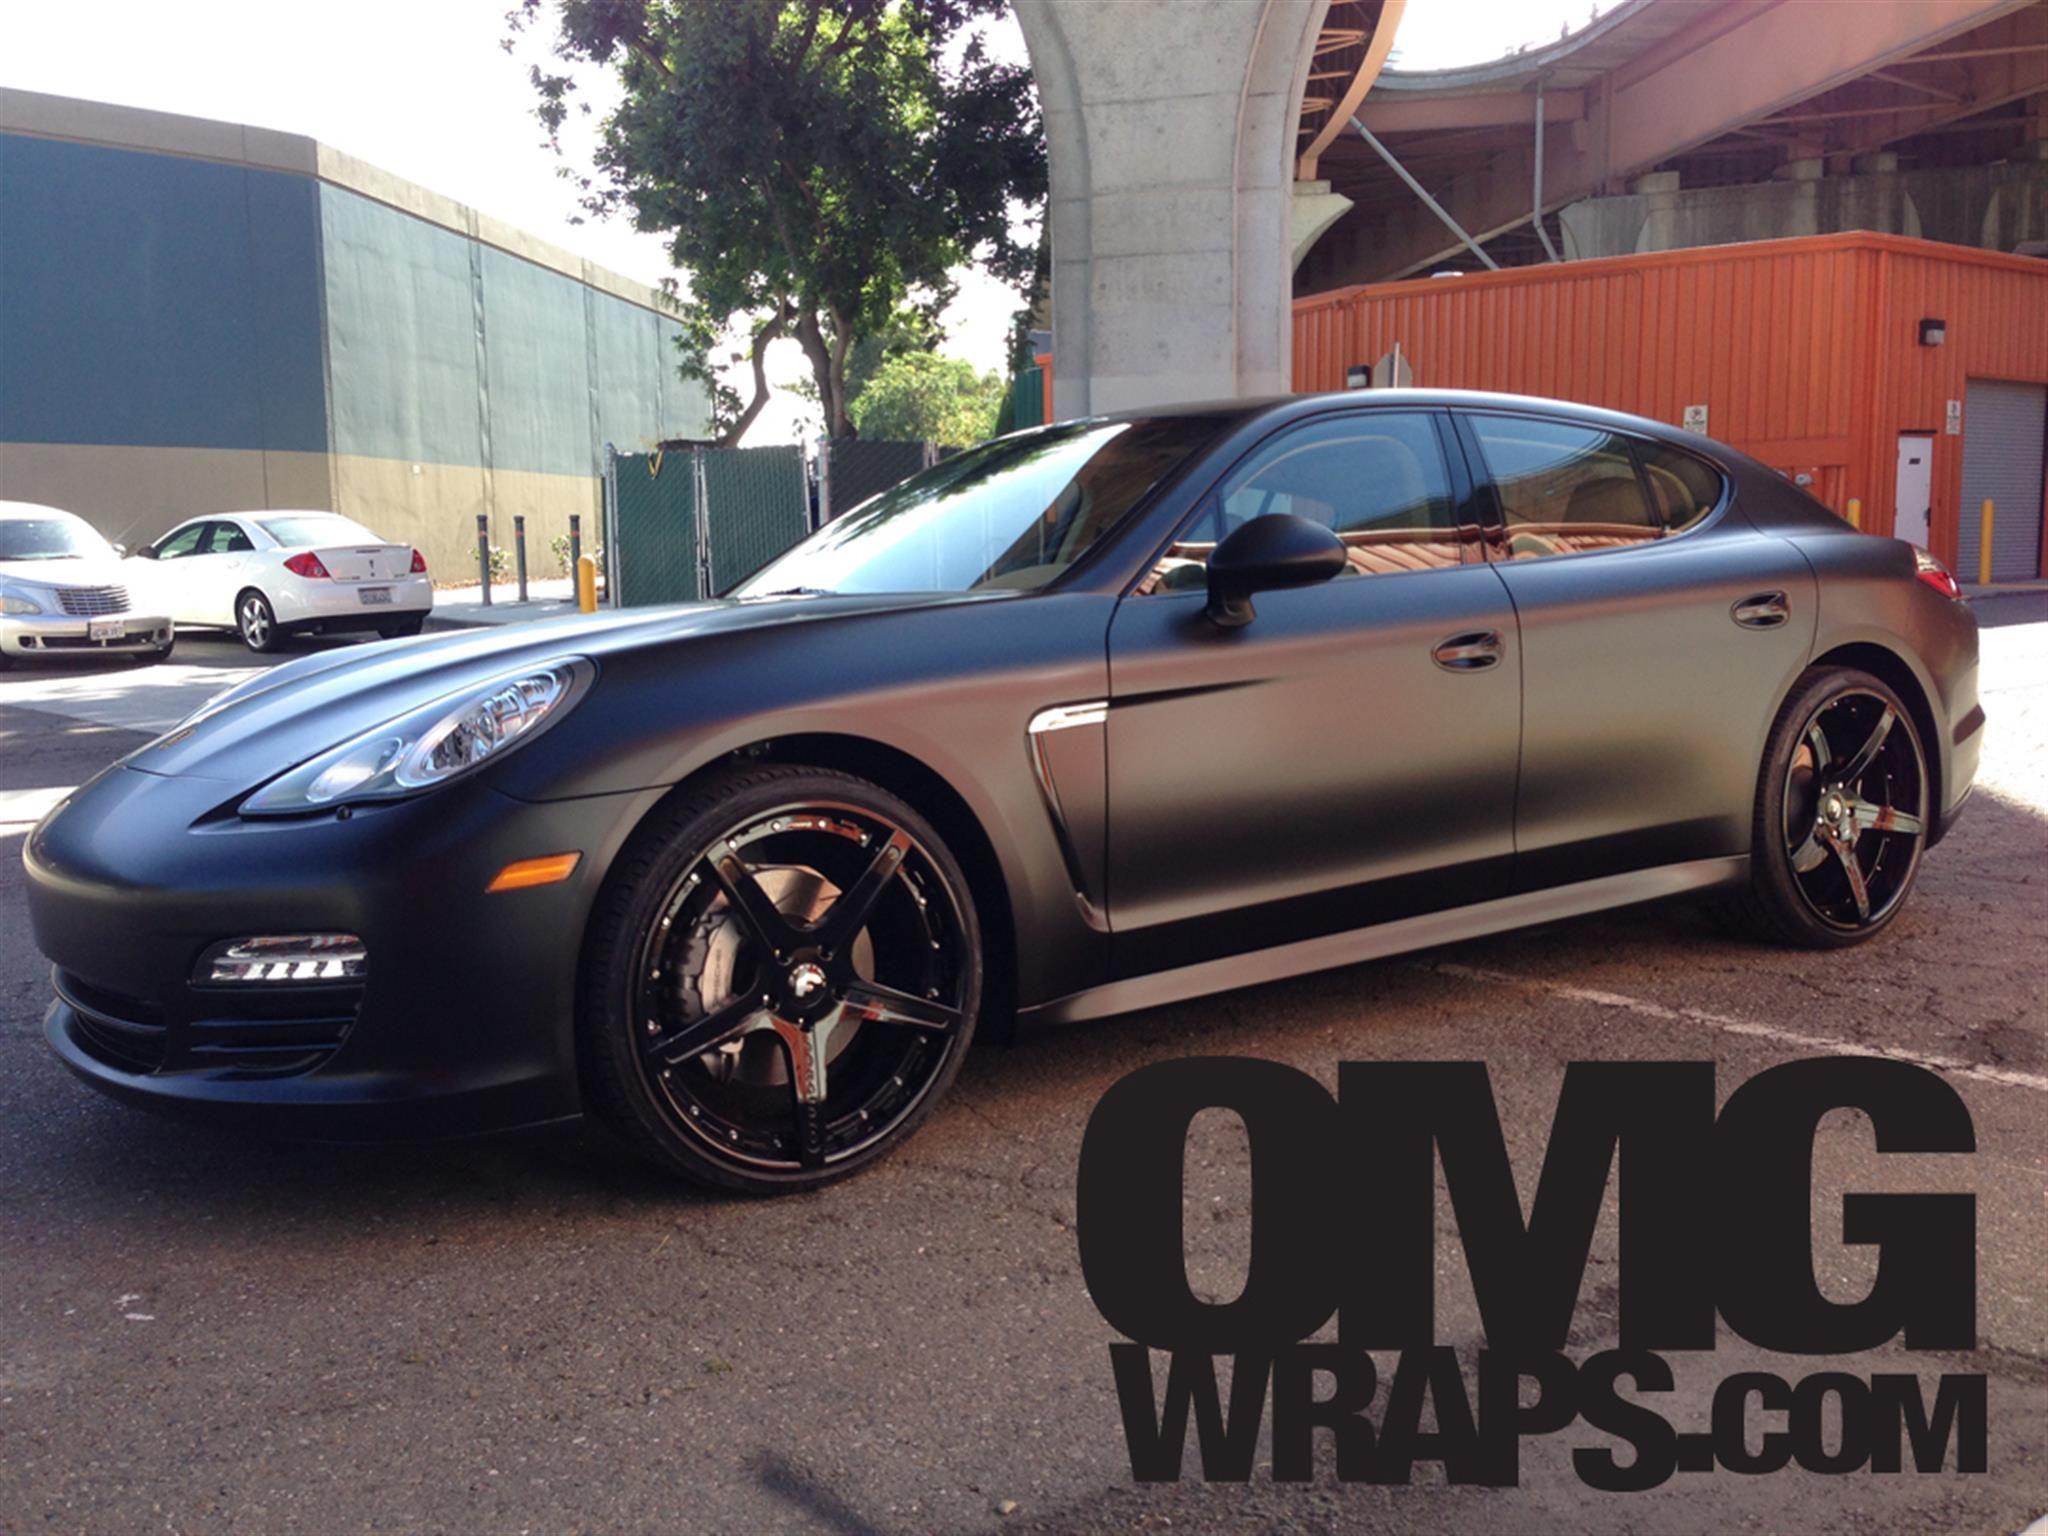 Porsche Panamera Satin Matte Wrap Omgwraps Com Stockton Ca Us